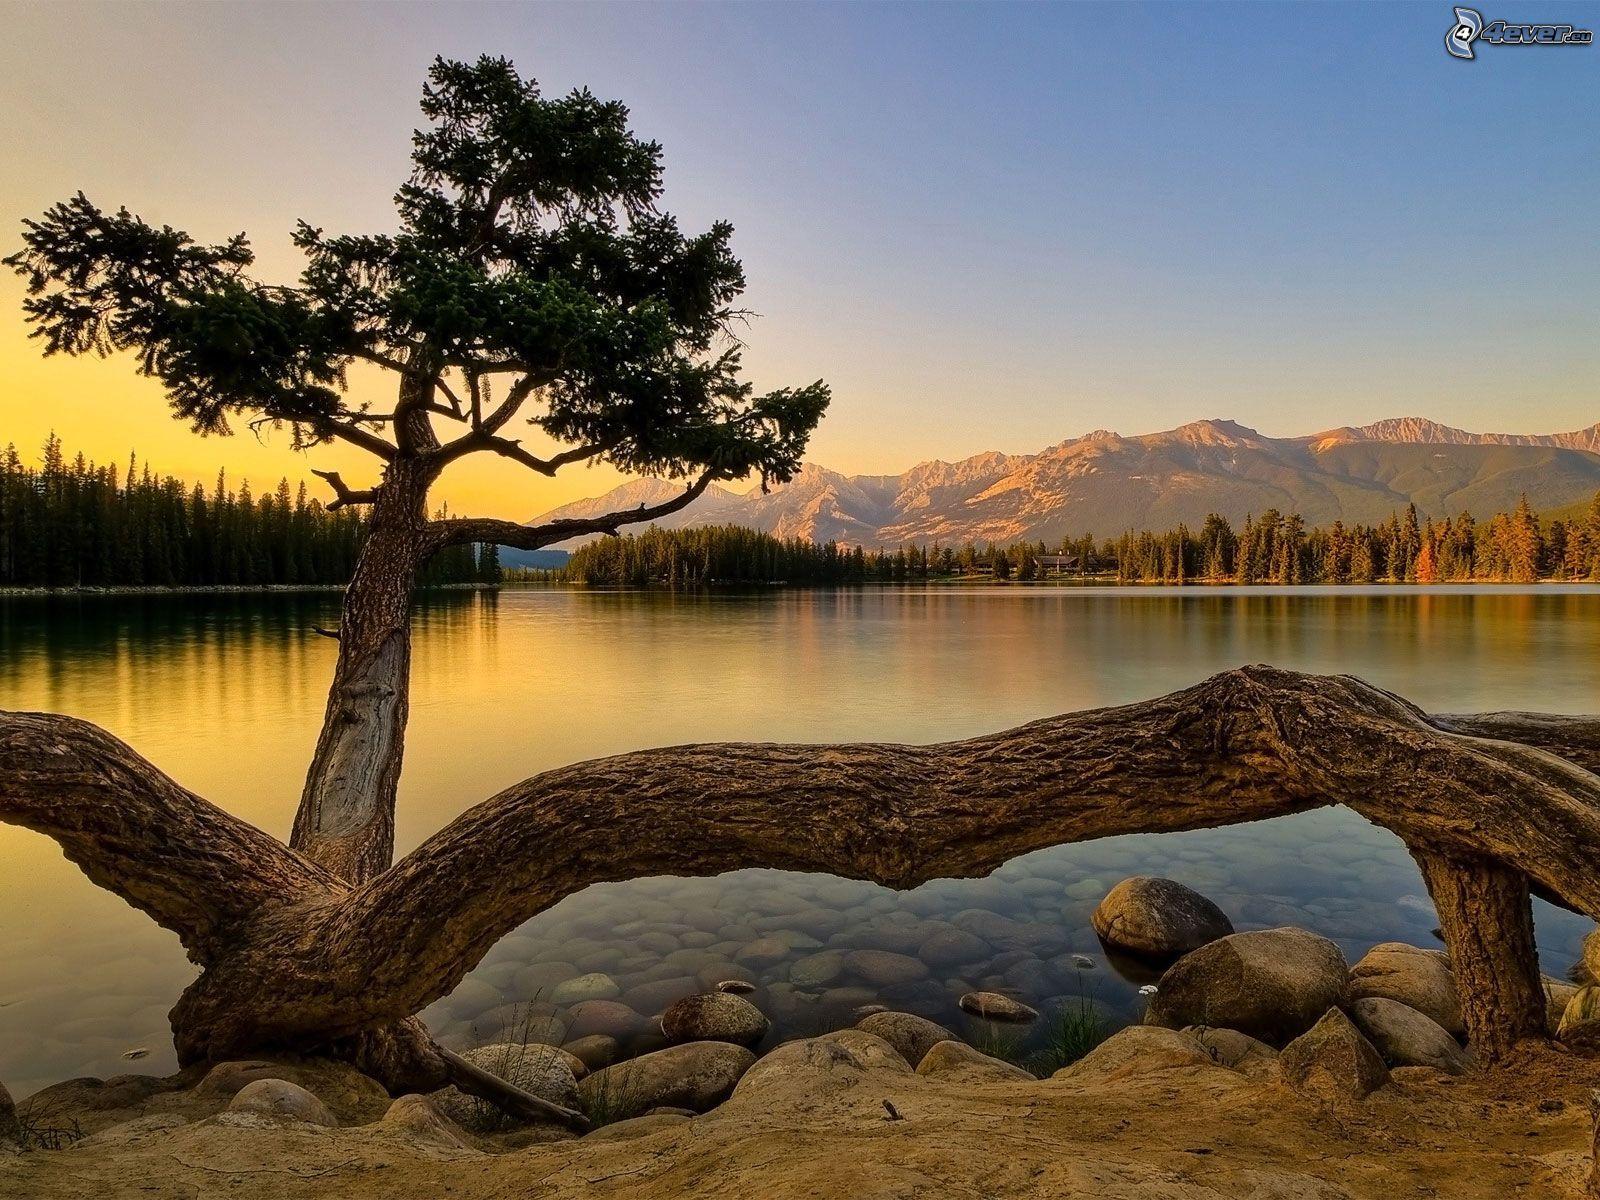 Zalazak sunca  - Page 5 Strom-nad-jazerom,-ihlicnan,-zapad-slnka,-hory,-pokojna-vodna-hladina,-les-149363